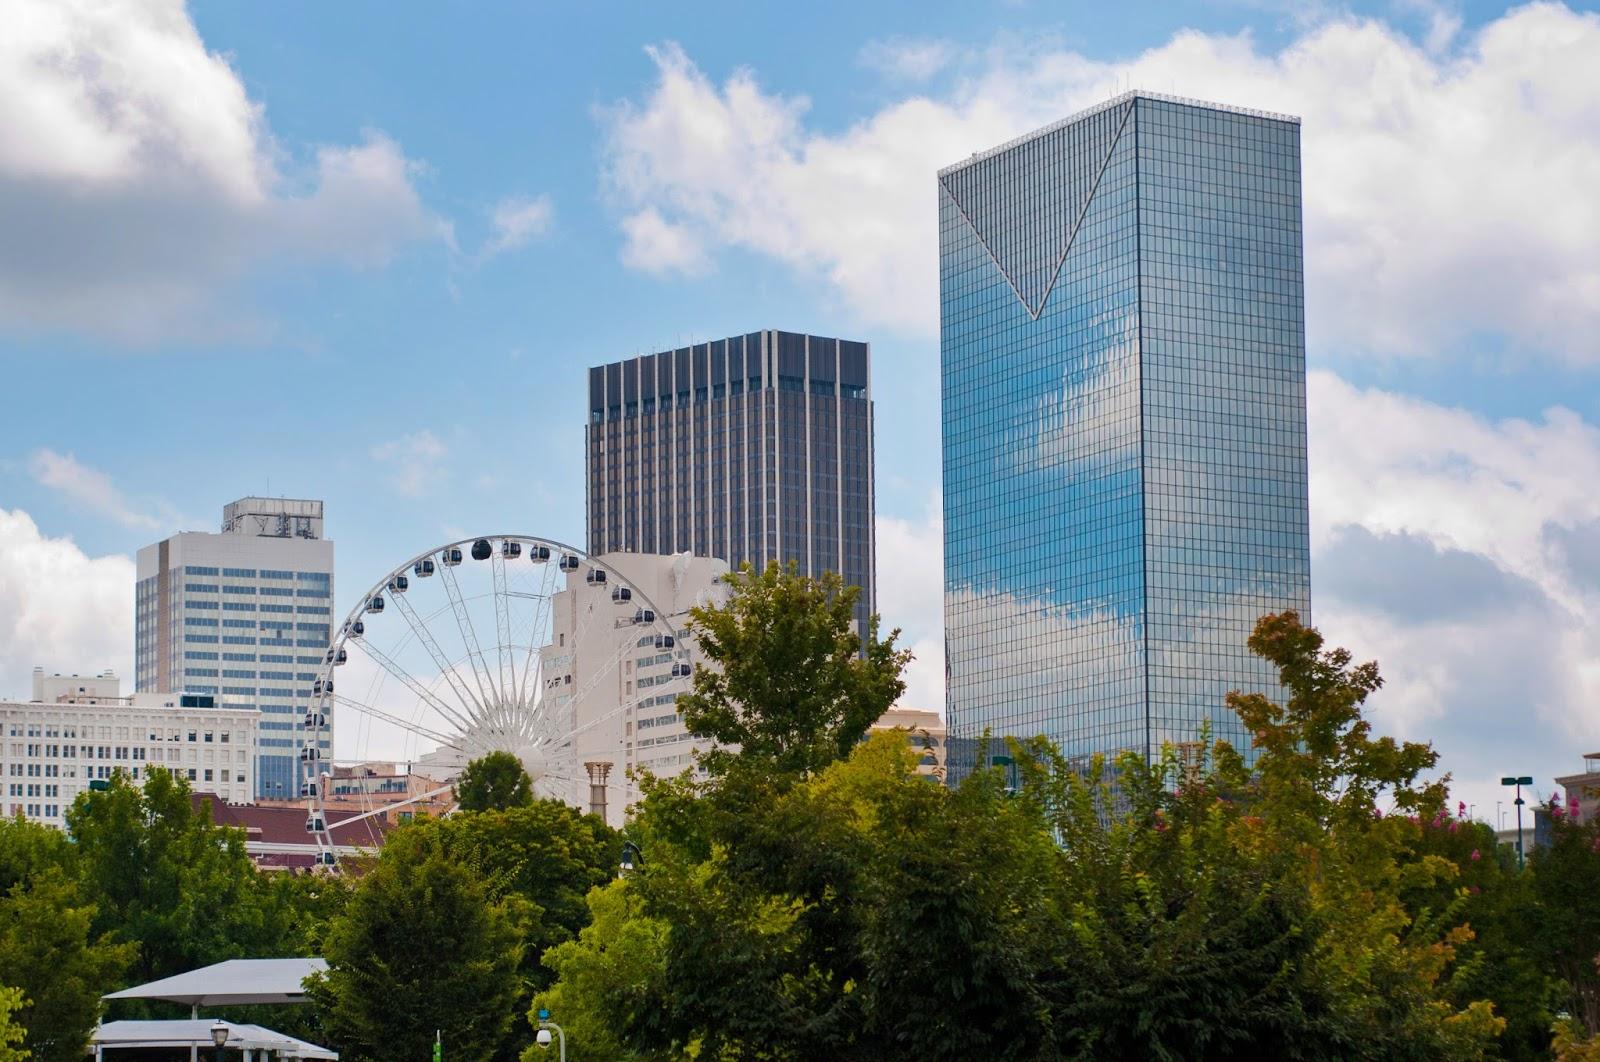 Top 15 Family Friendly Attractions in Atlanta